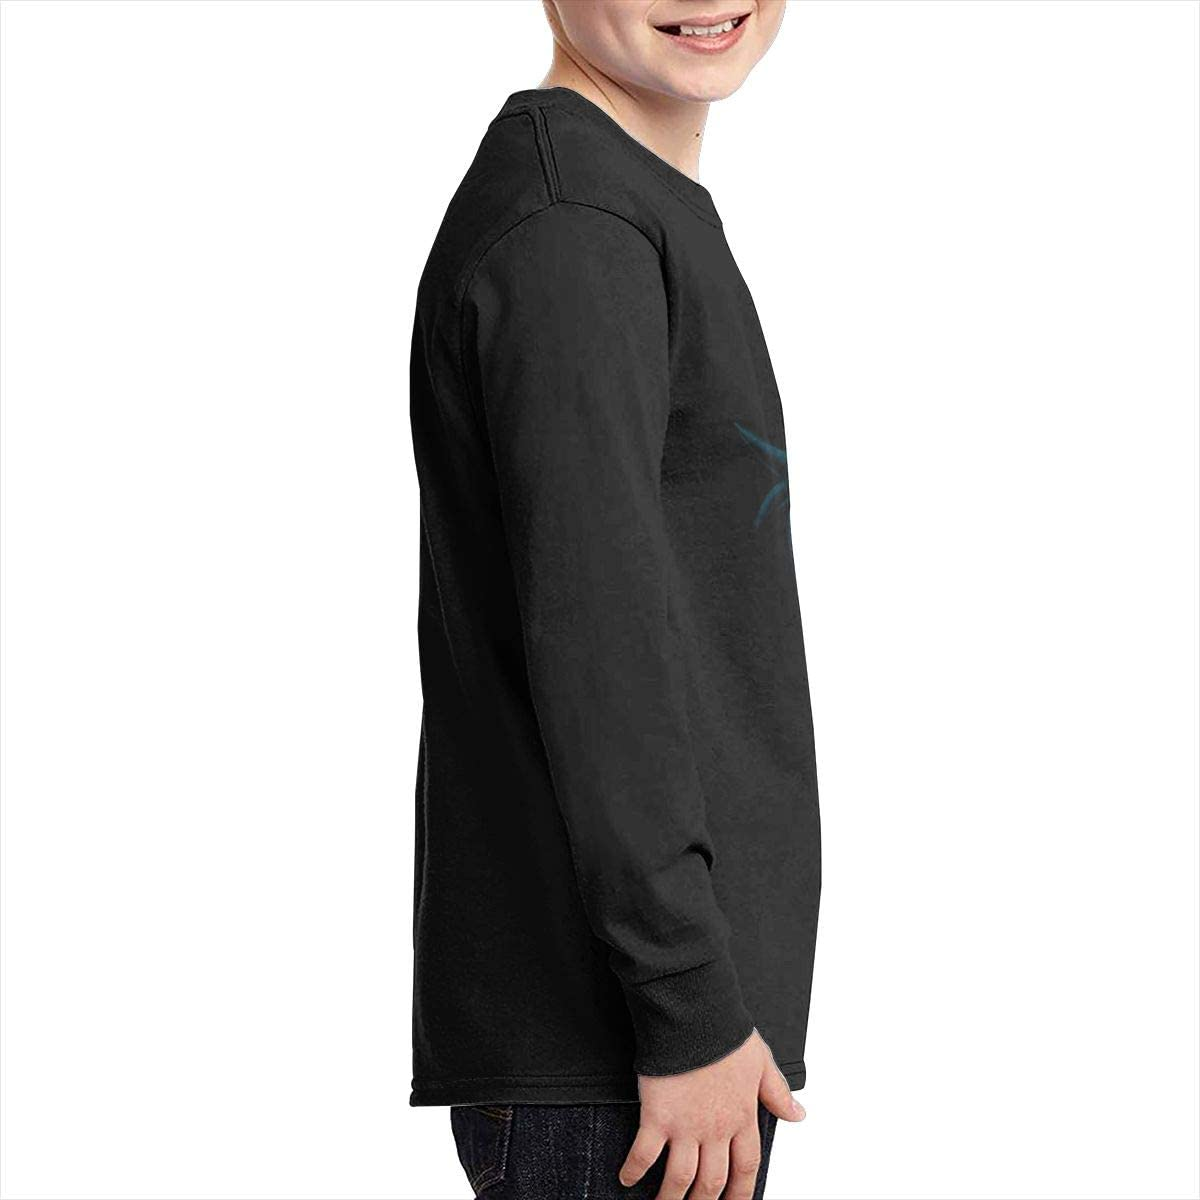 Inner Halloween Boys Long Sleeve T-Shirt,Fashion Youth Tops